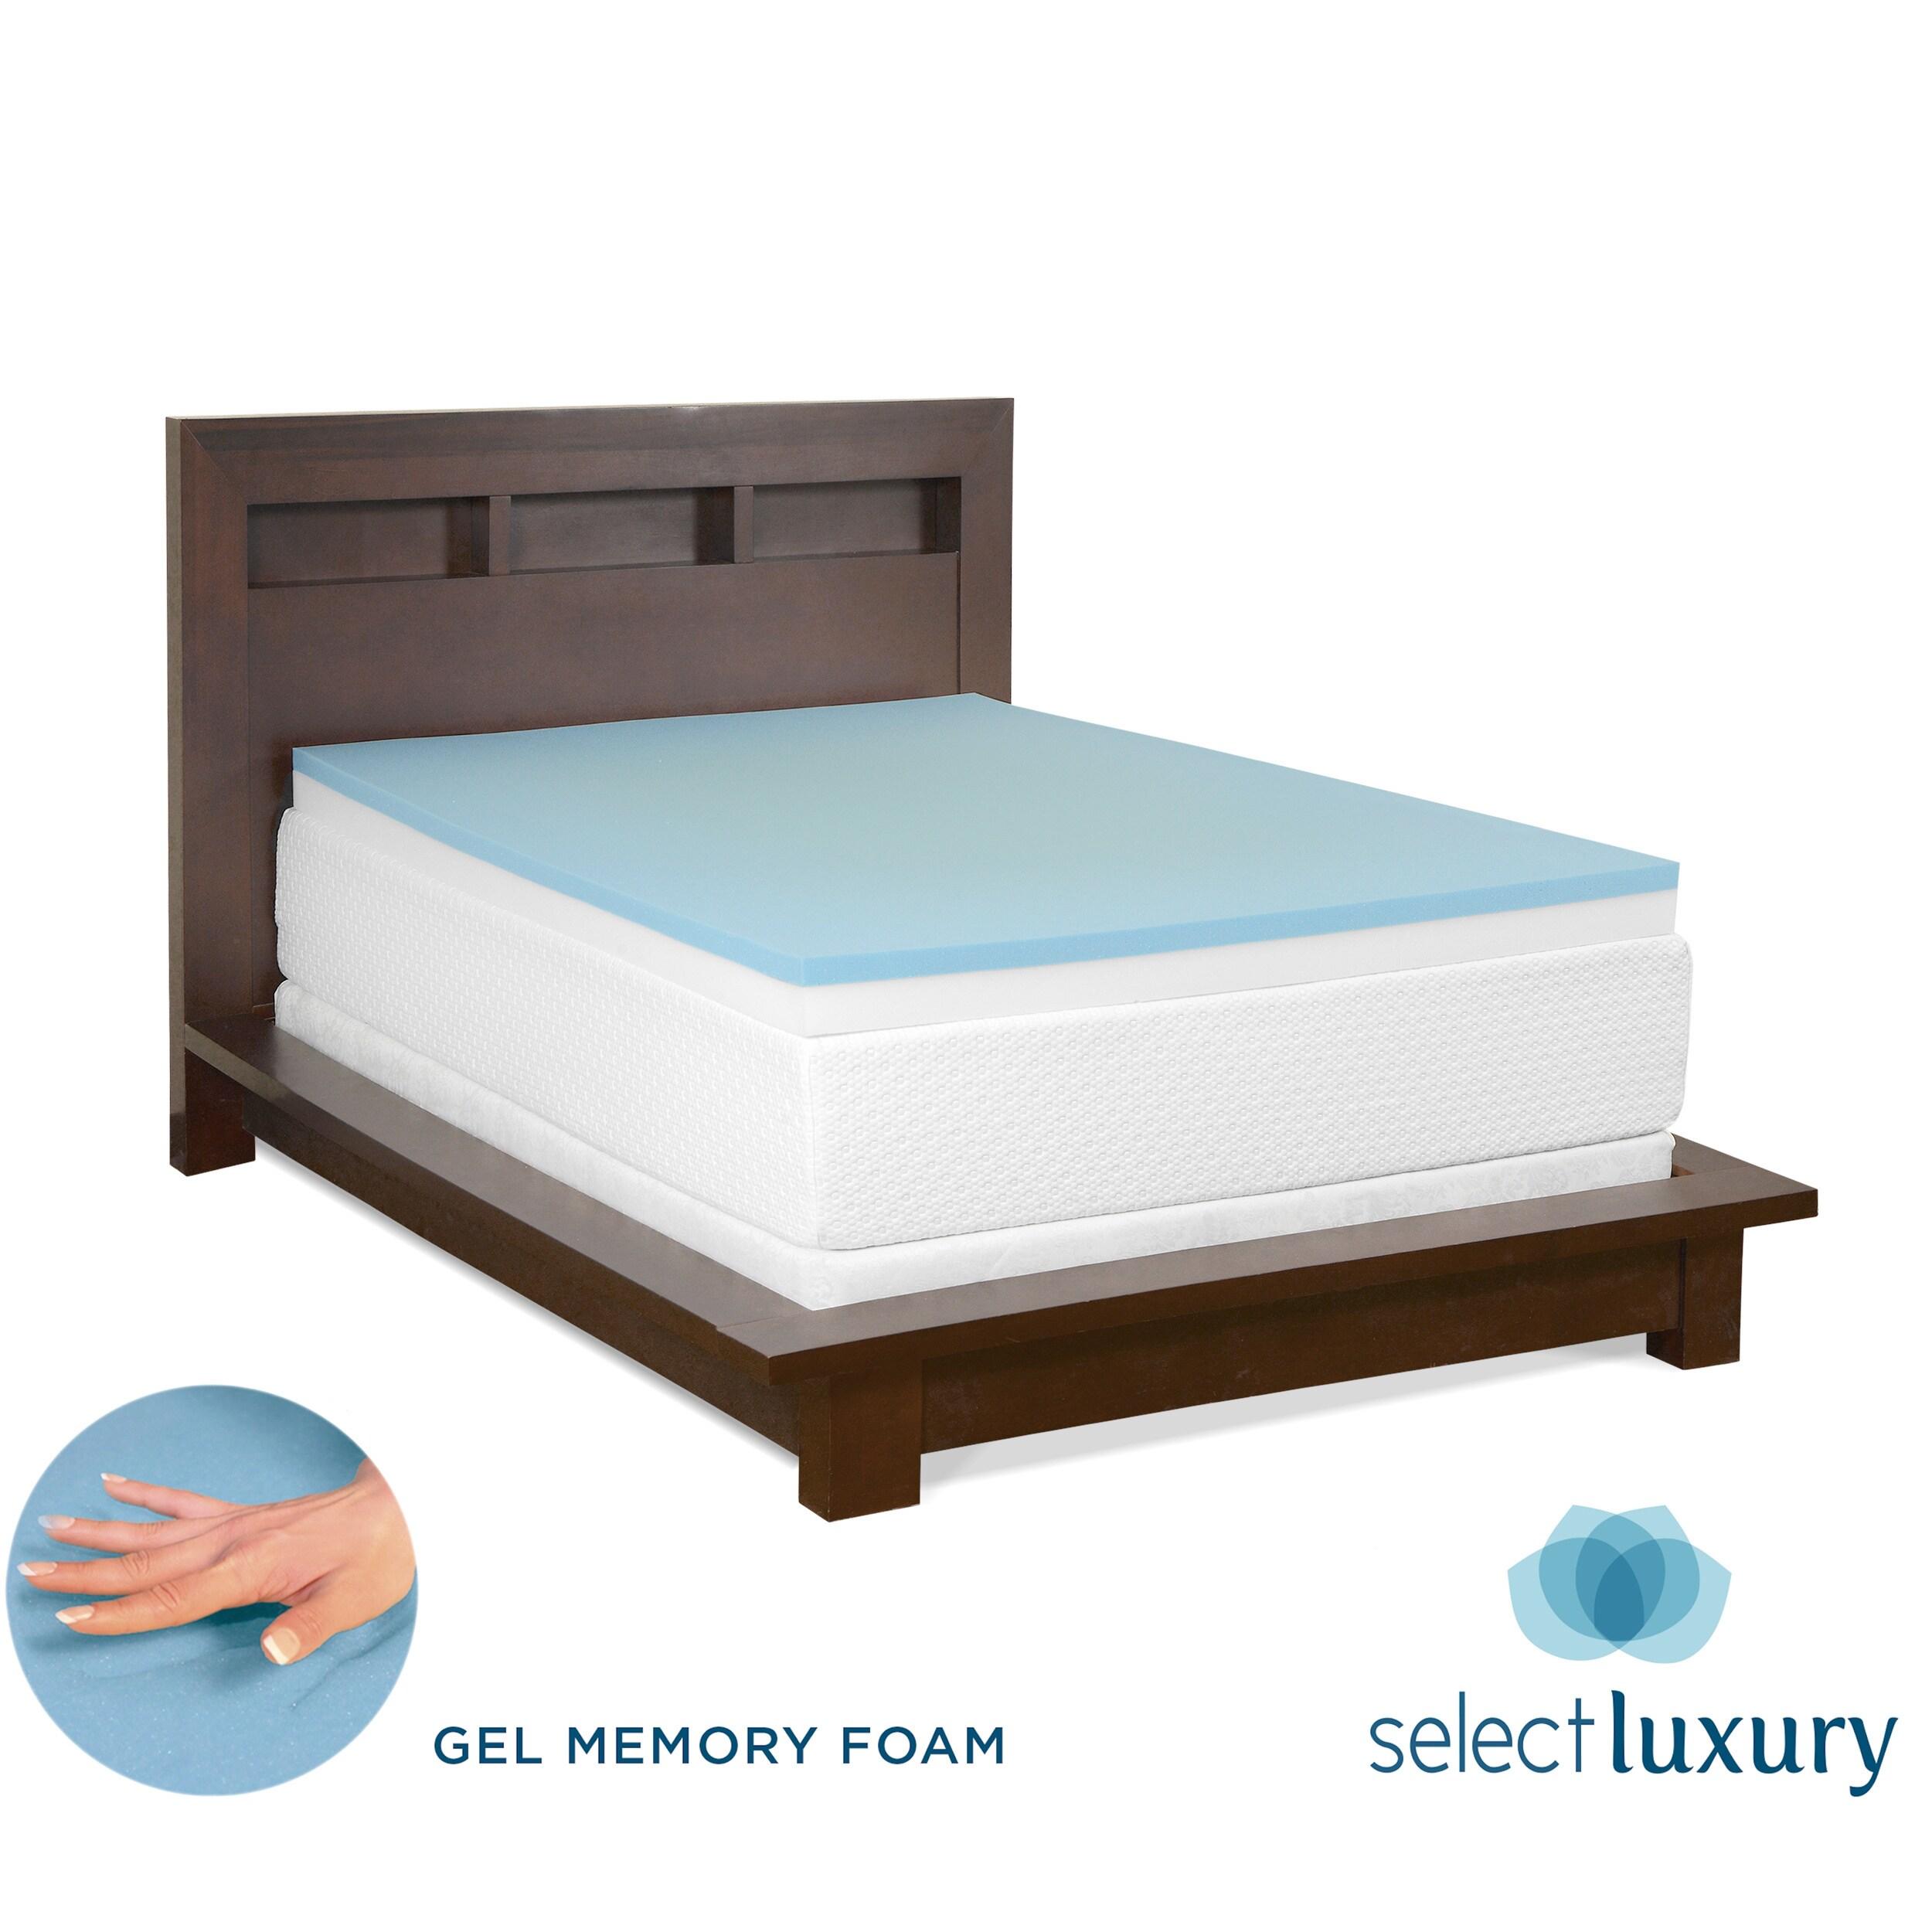 serta 4 inch memory foam mattress topper with contour pillows memory bed mattress sale. Black Bedroom Furniture Sets. Home Design Ideas